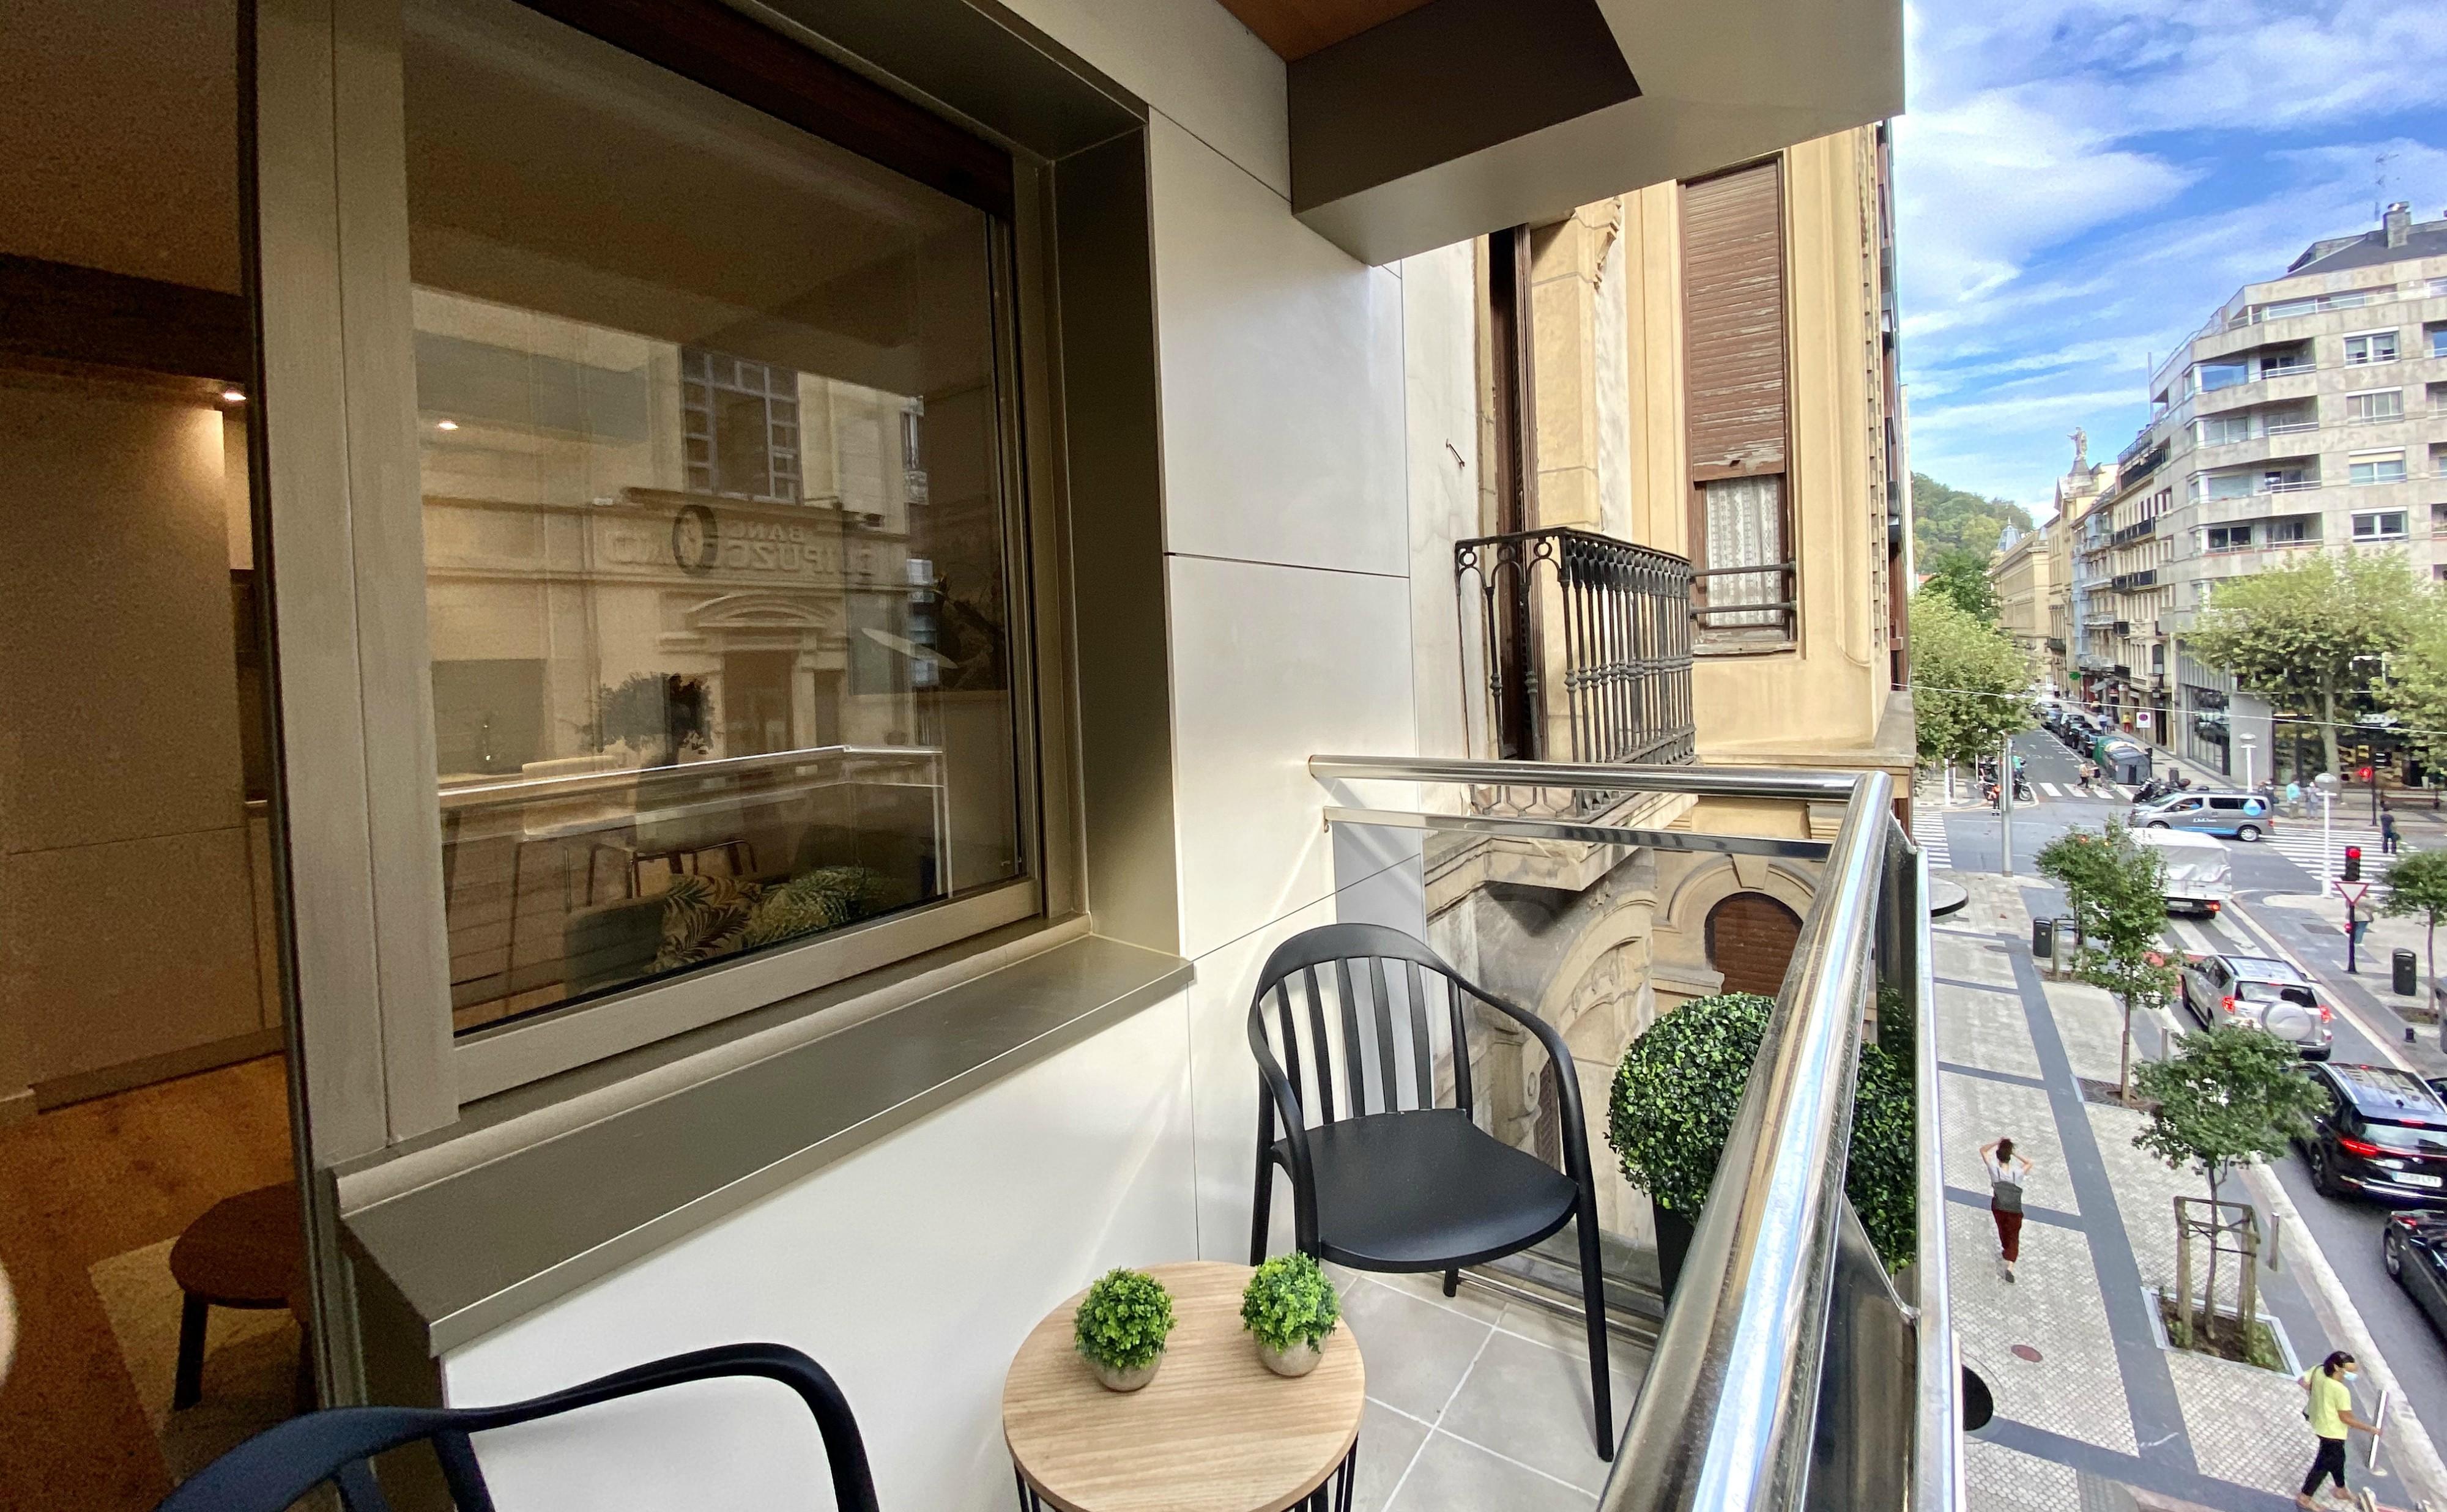 CENTRO. REFORMA INTEGRAL, Apartamento con terraza